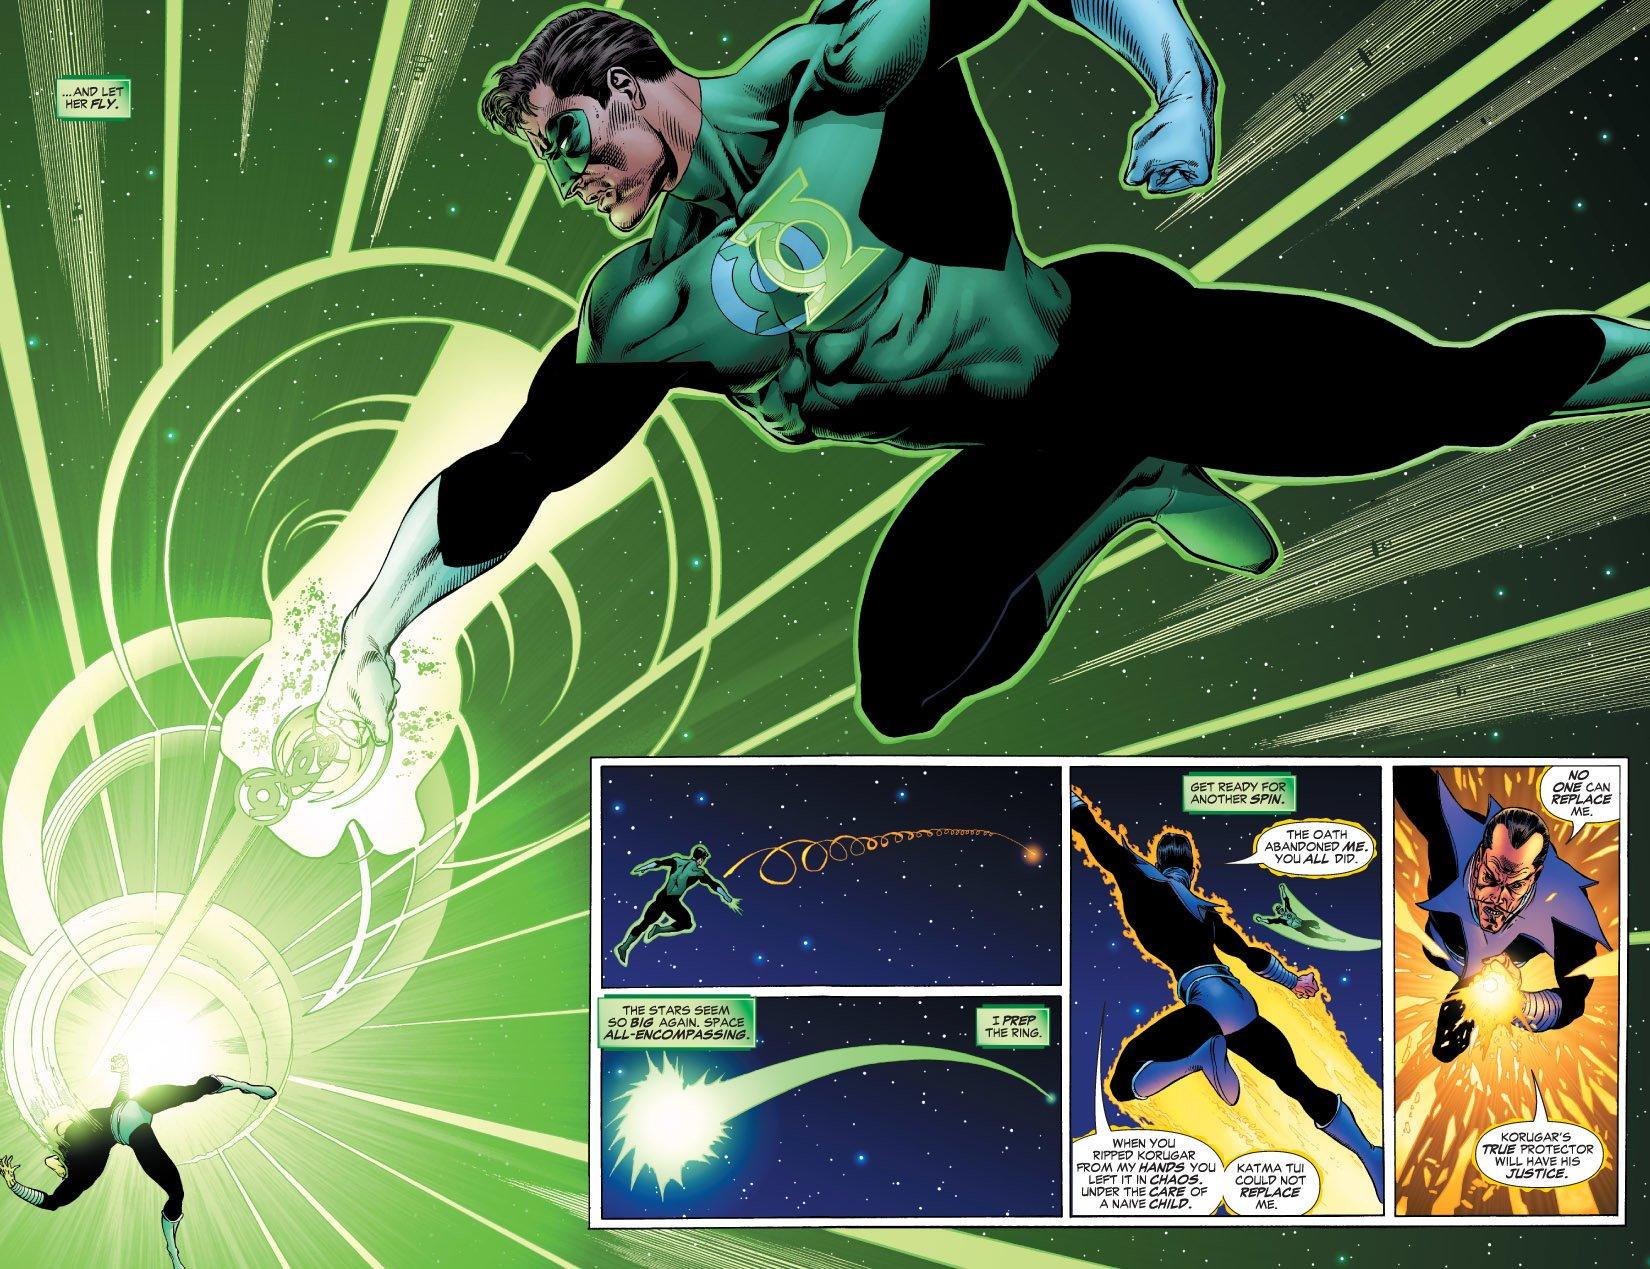 Green Lantern Rebirth Wallpaper and Background Image 1650x1269 1650x1269